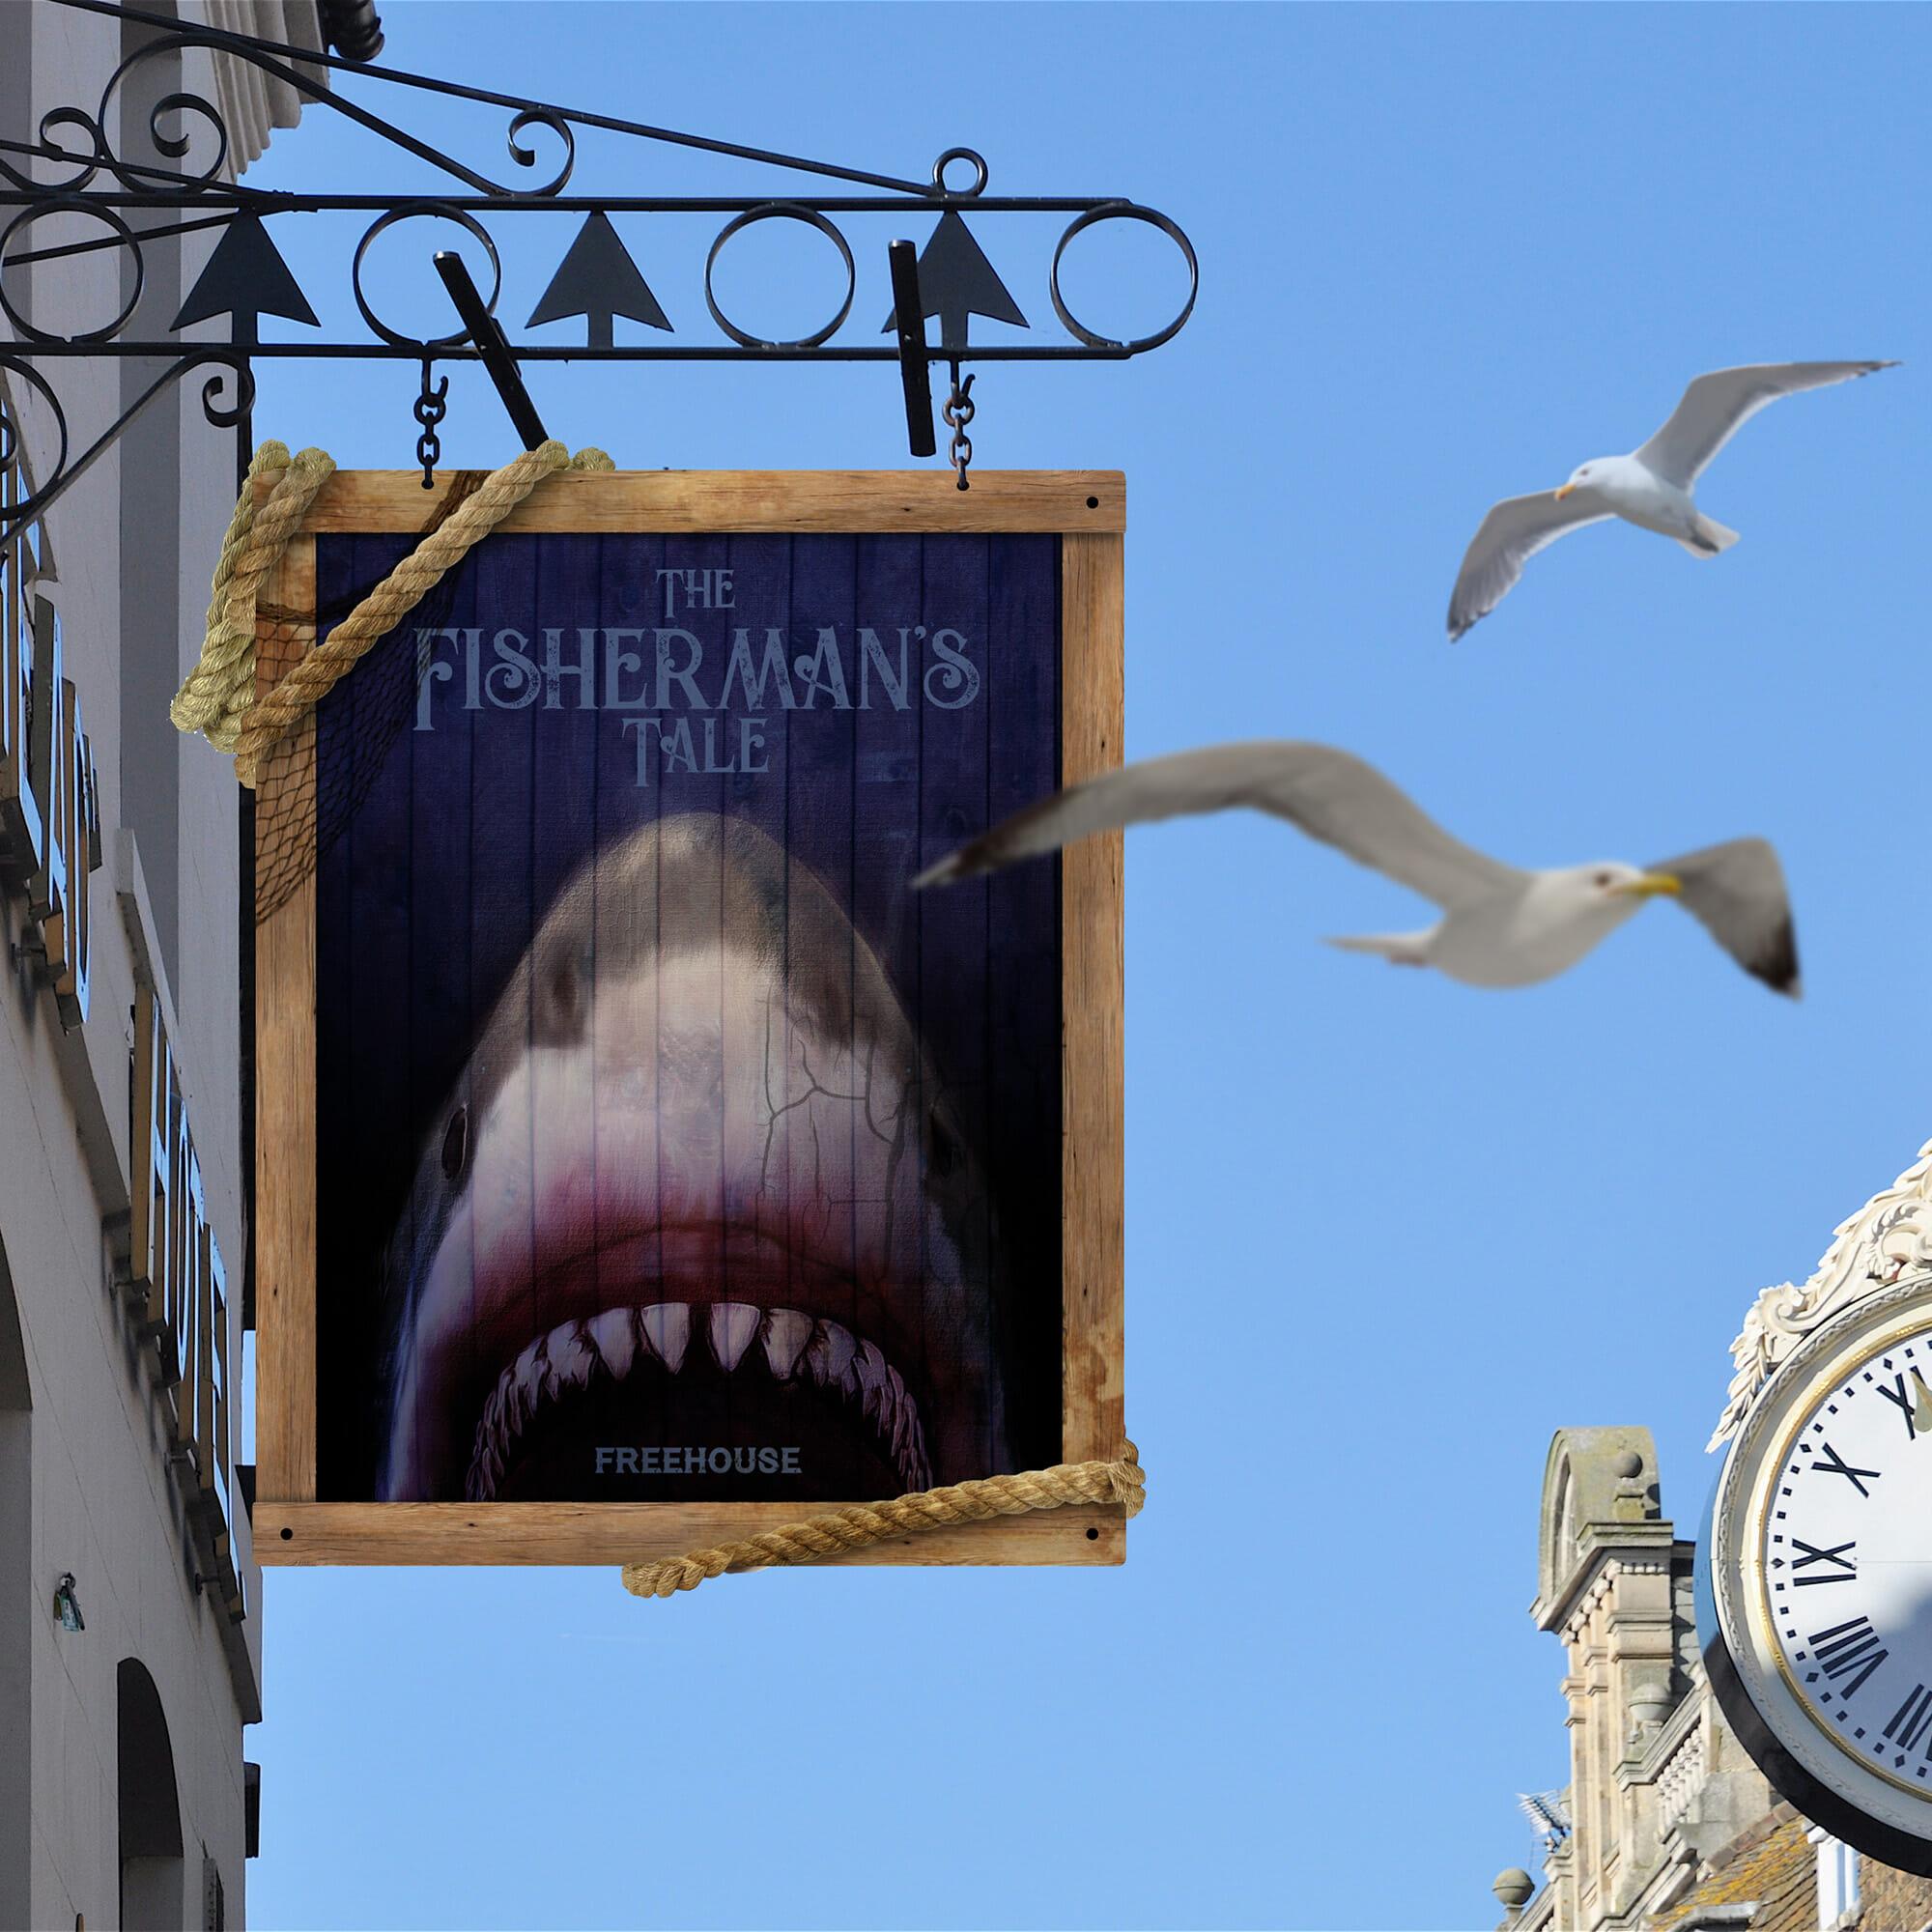 The Fisherman's Tale